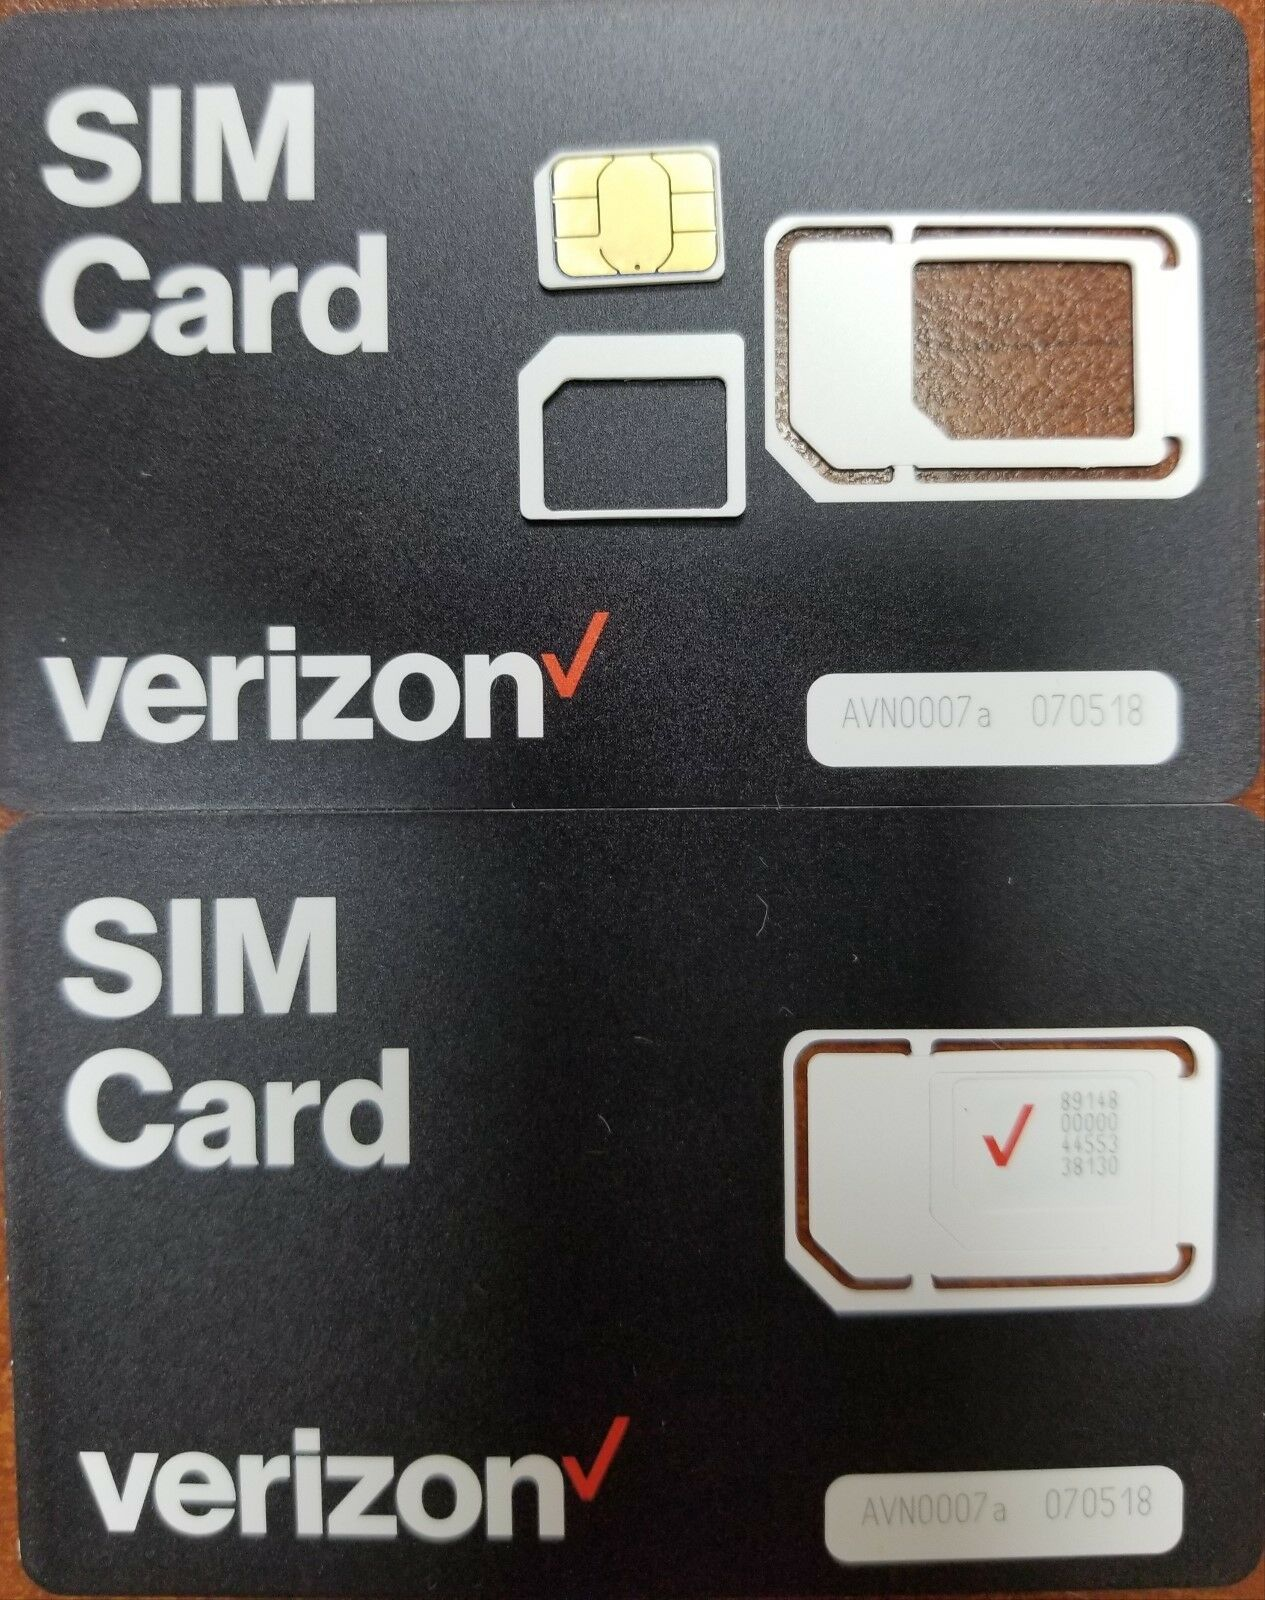 NEW VERIZON Nano, Micro, standard SIM Card 4G LTE • NEW Ge